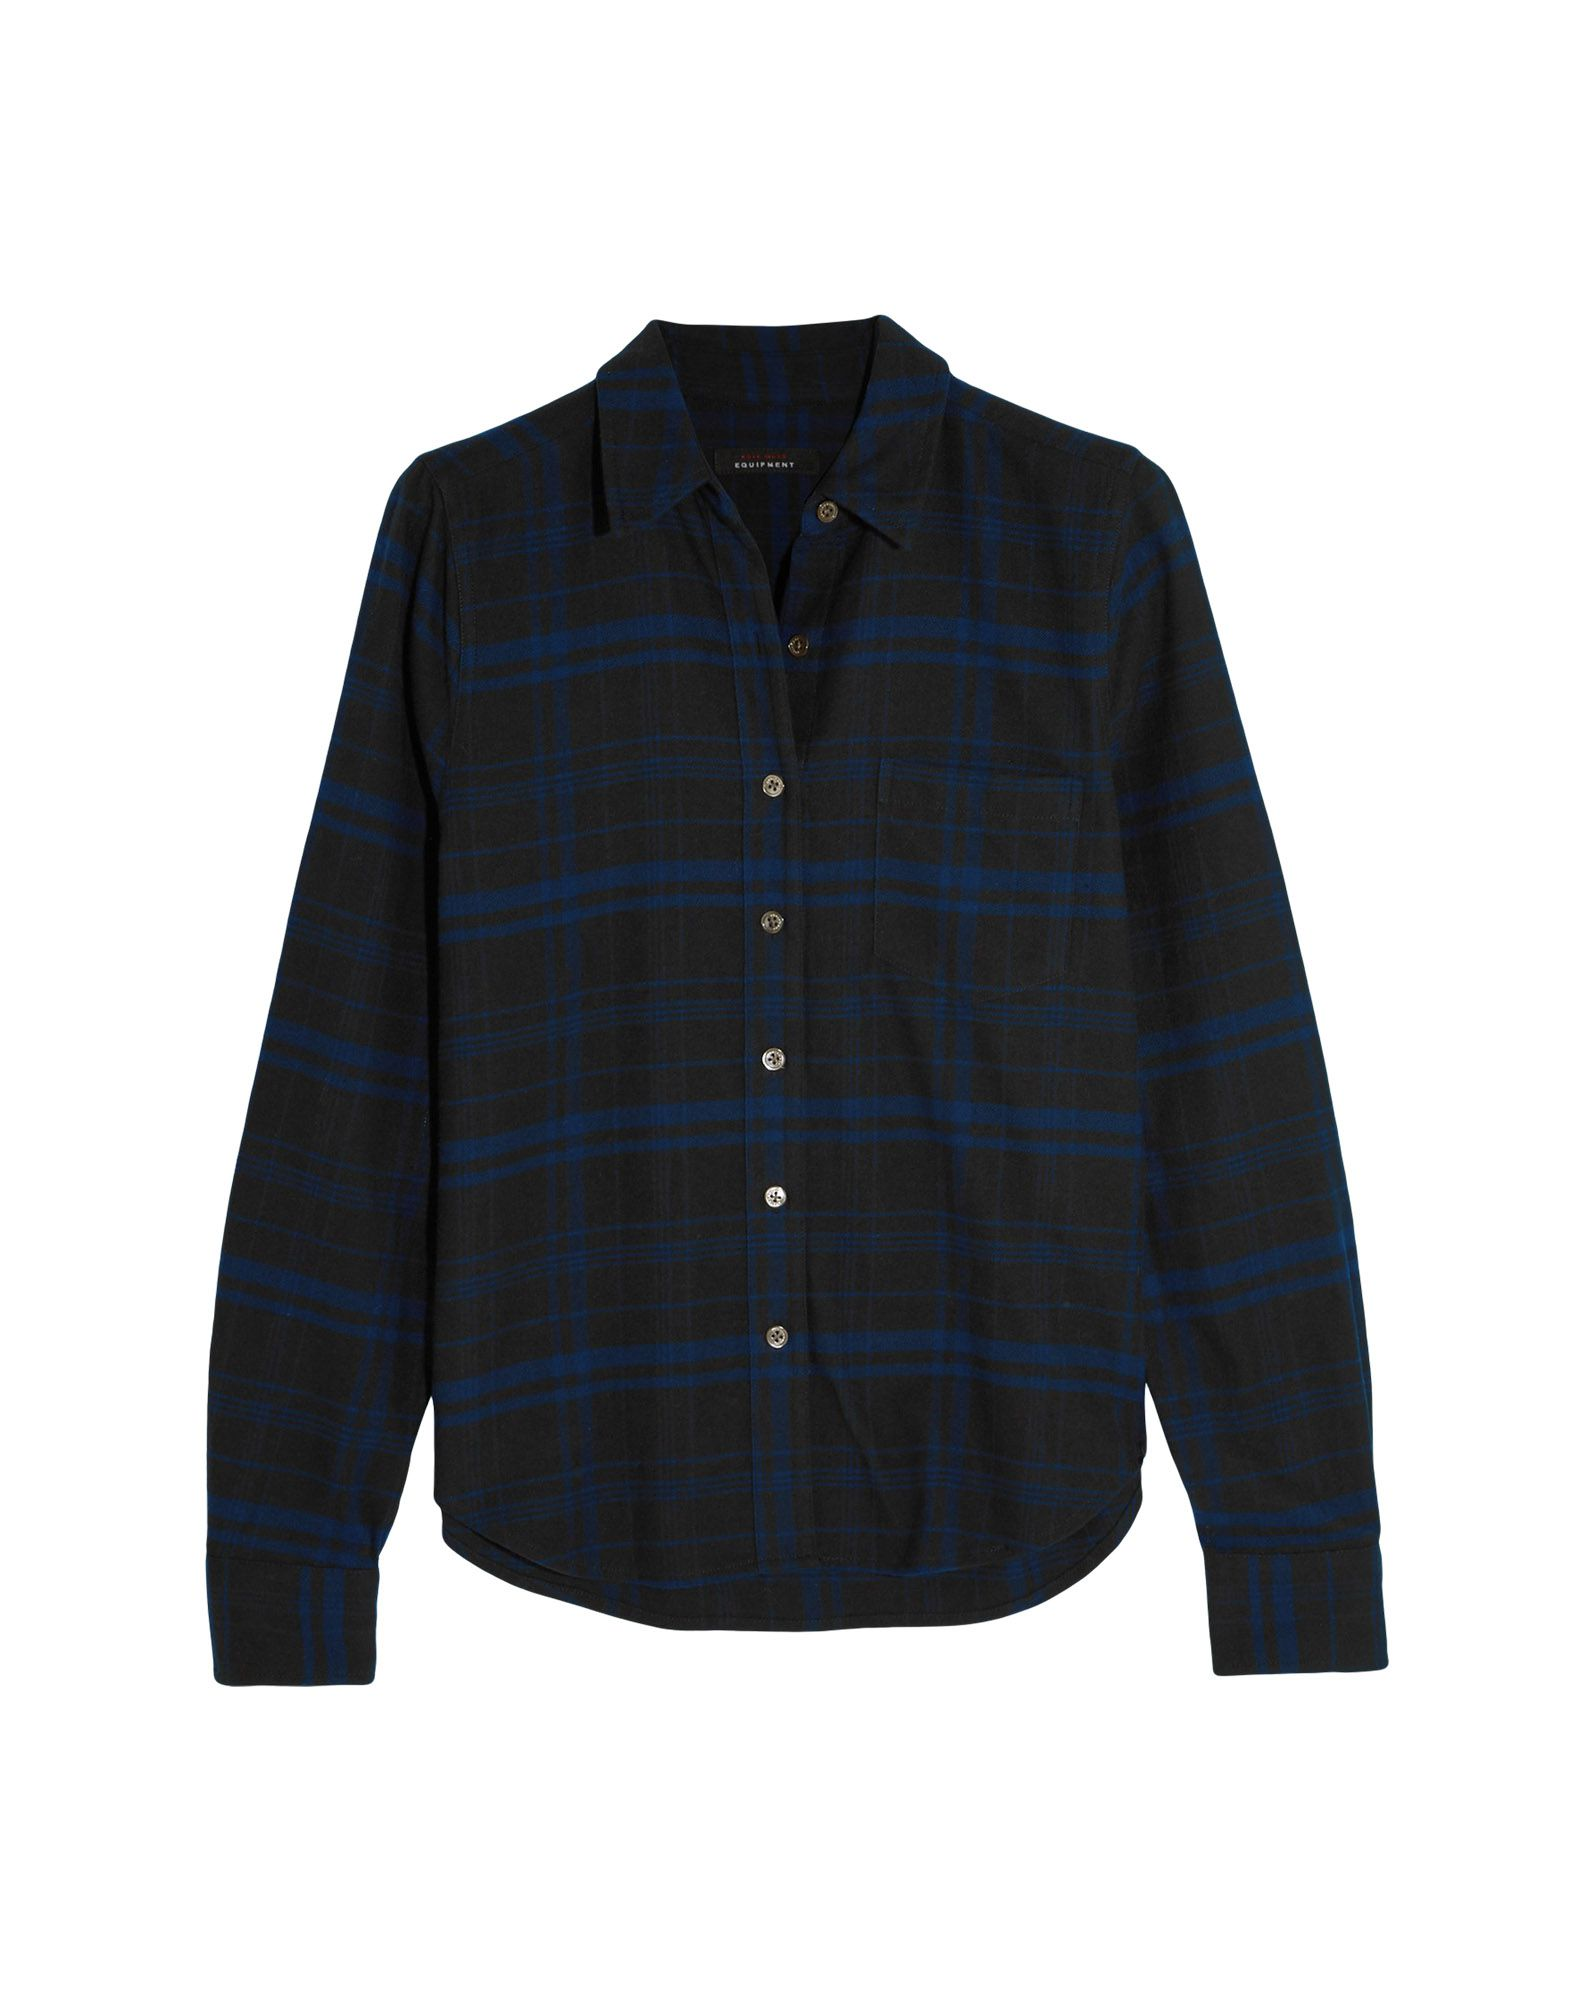 KATE MOSS EQUIPMENT Checked Shirt in Dark Blue